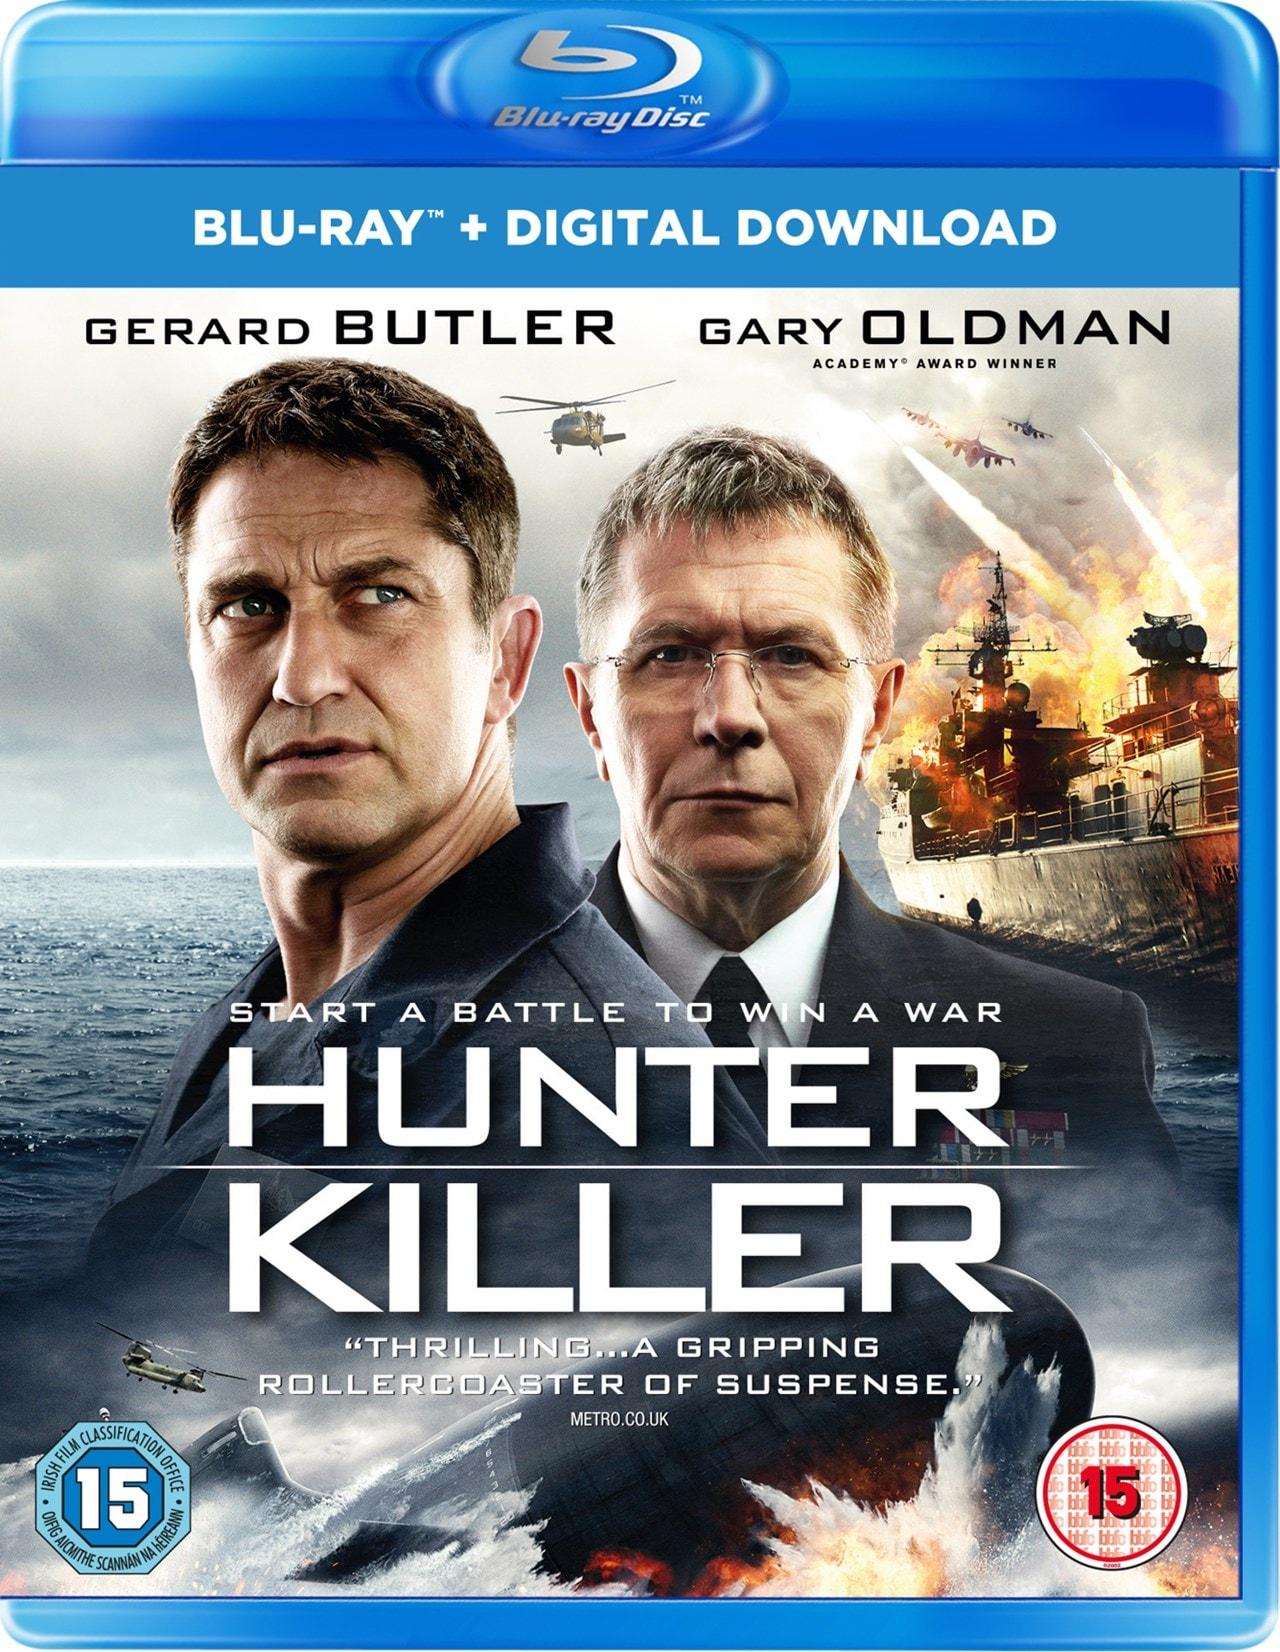 Hunter Killer Blu Ray Free Shipping Over 20 Hmv Store